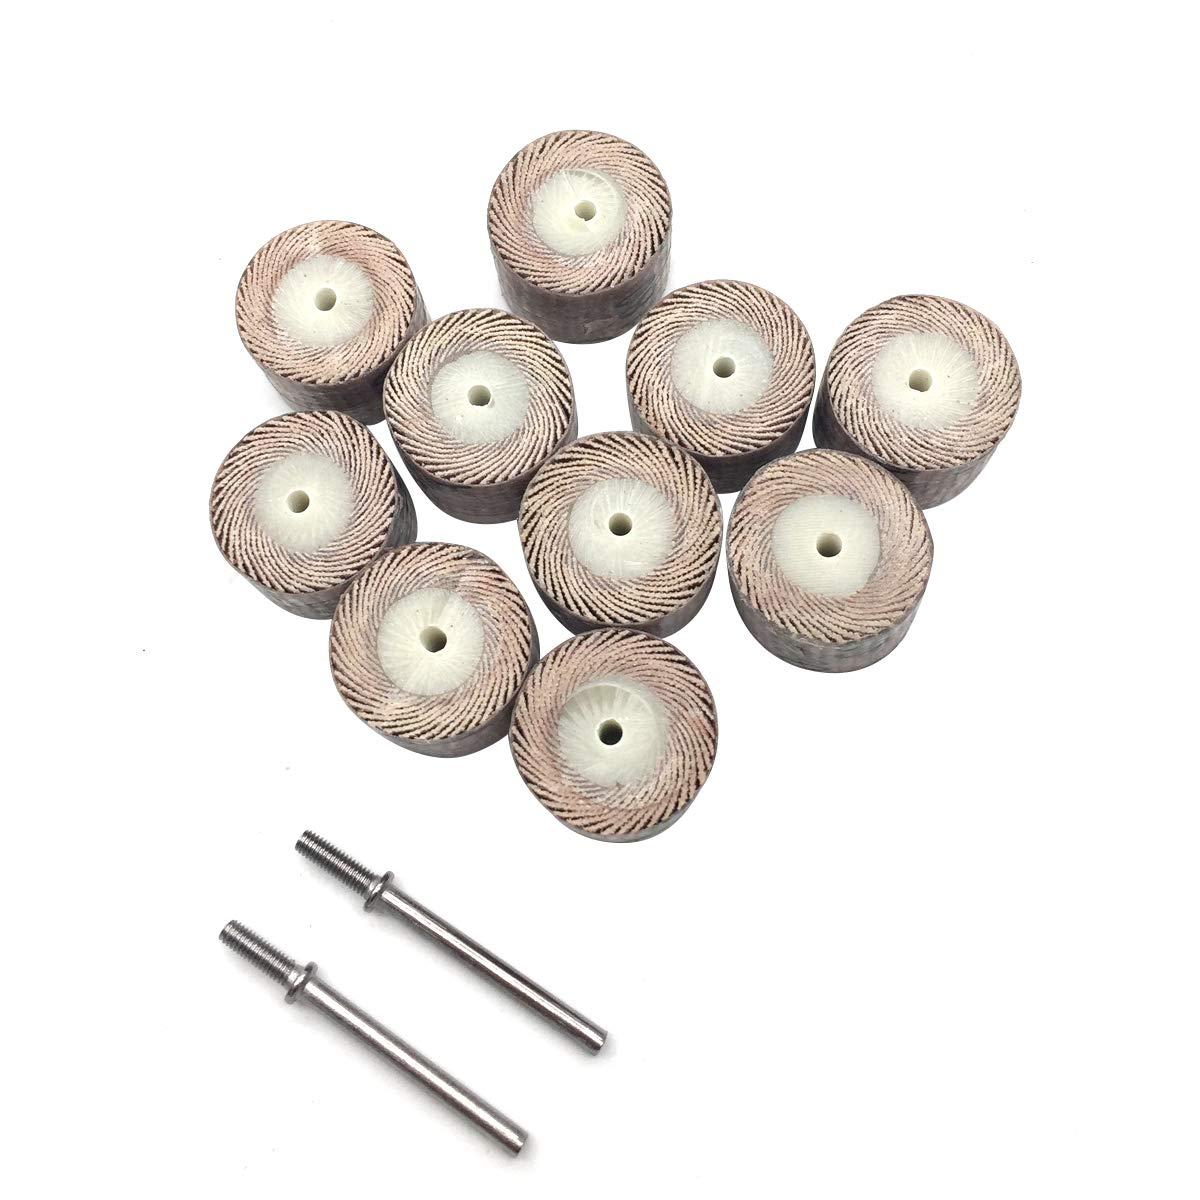 30 x 25mm 1.18 x 1 30mm x 25mm 80 Grit 1//4 inch Shank Cylindrical Abrasive Polishing Grinding Discs Aluminum Oxide Flap Wheels Brown 10PCS